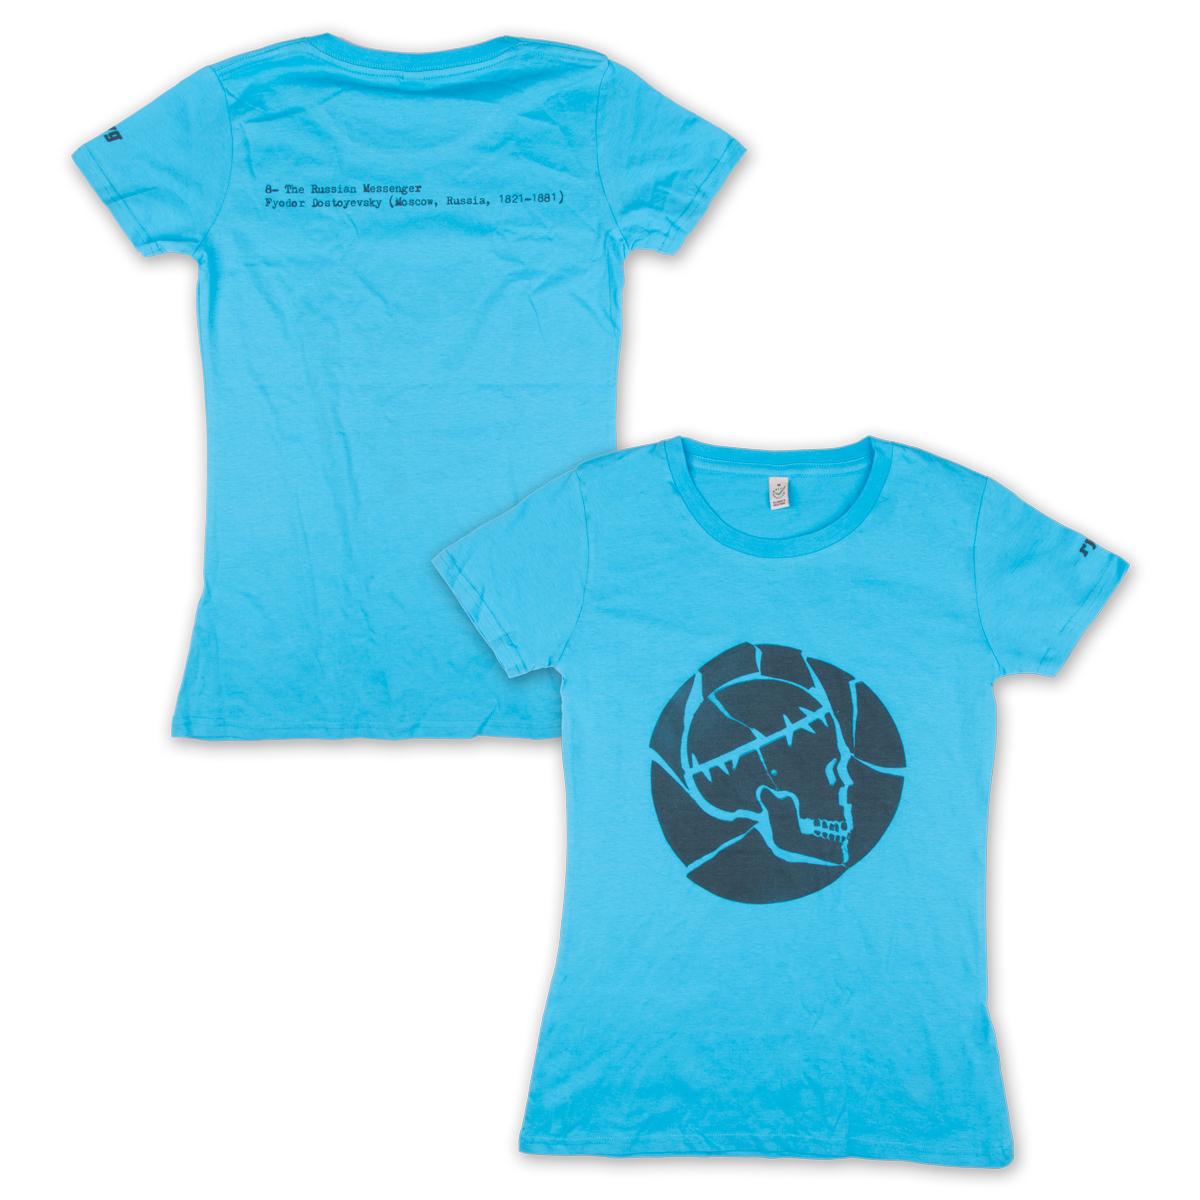 Rodrigo y Gabriela Women's Russian Messanger Skull T-Shirt